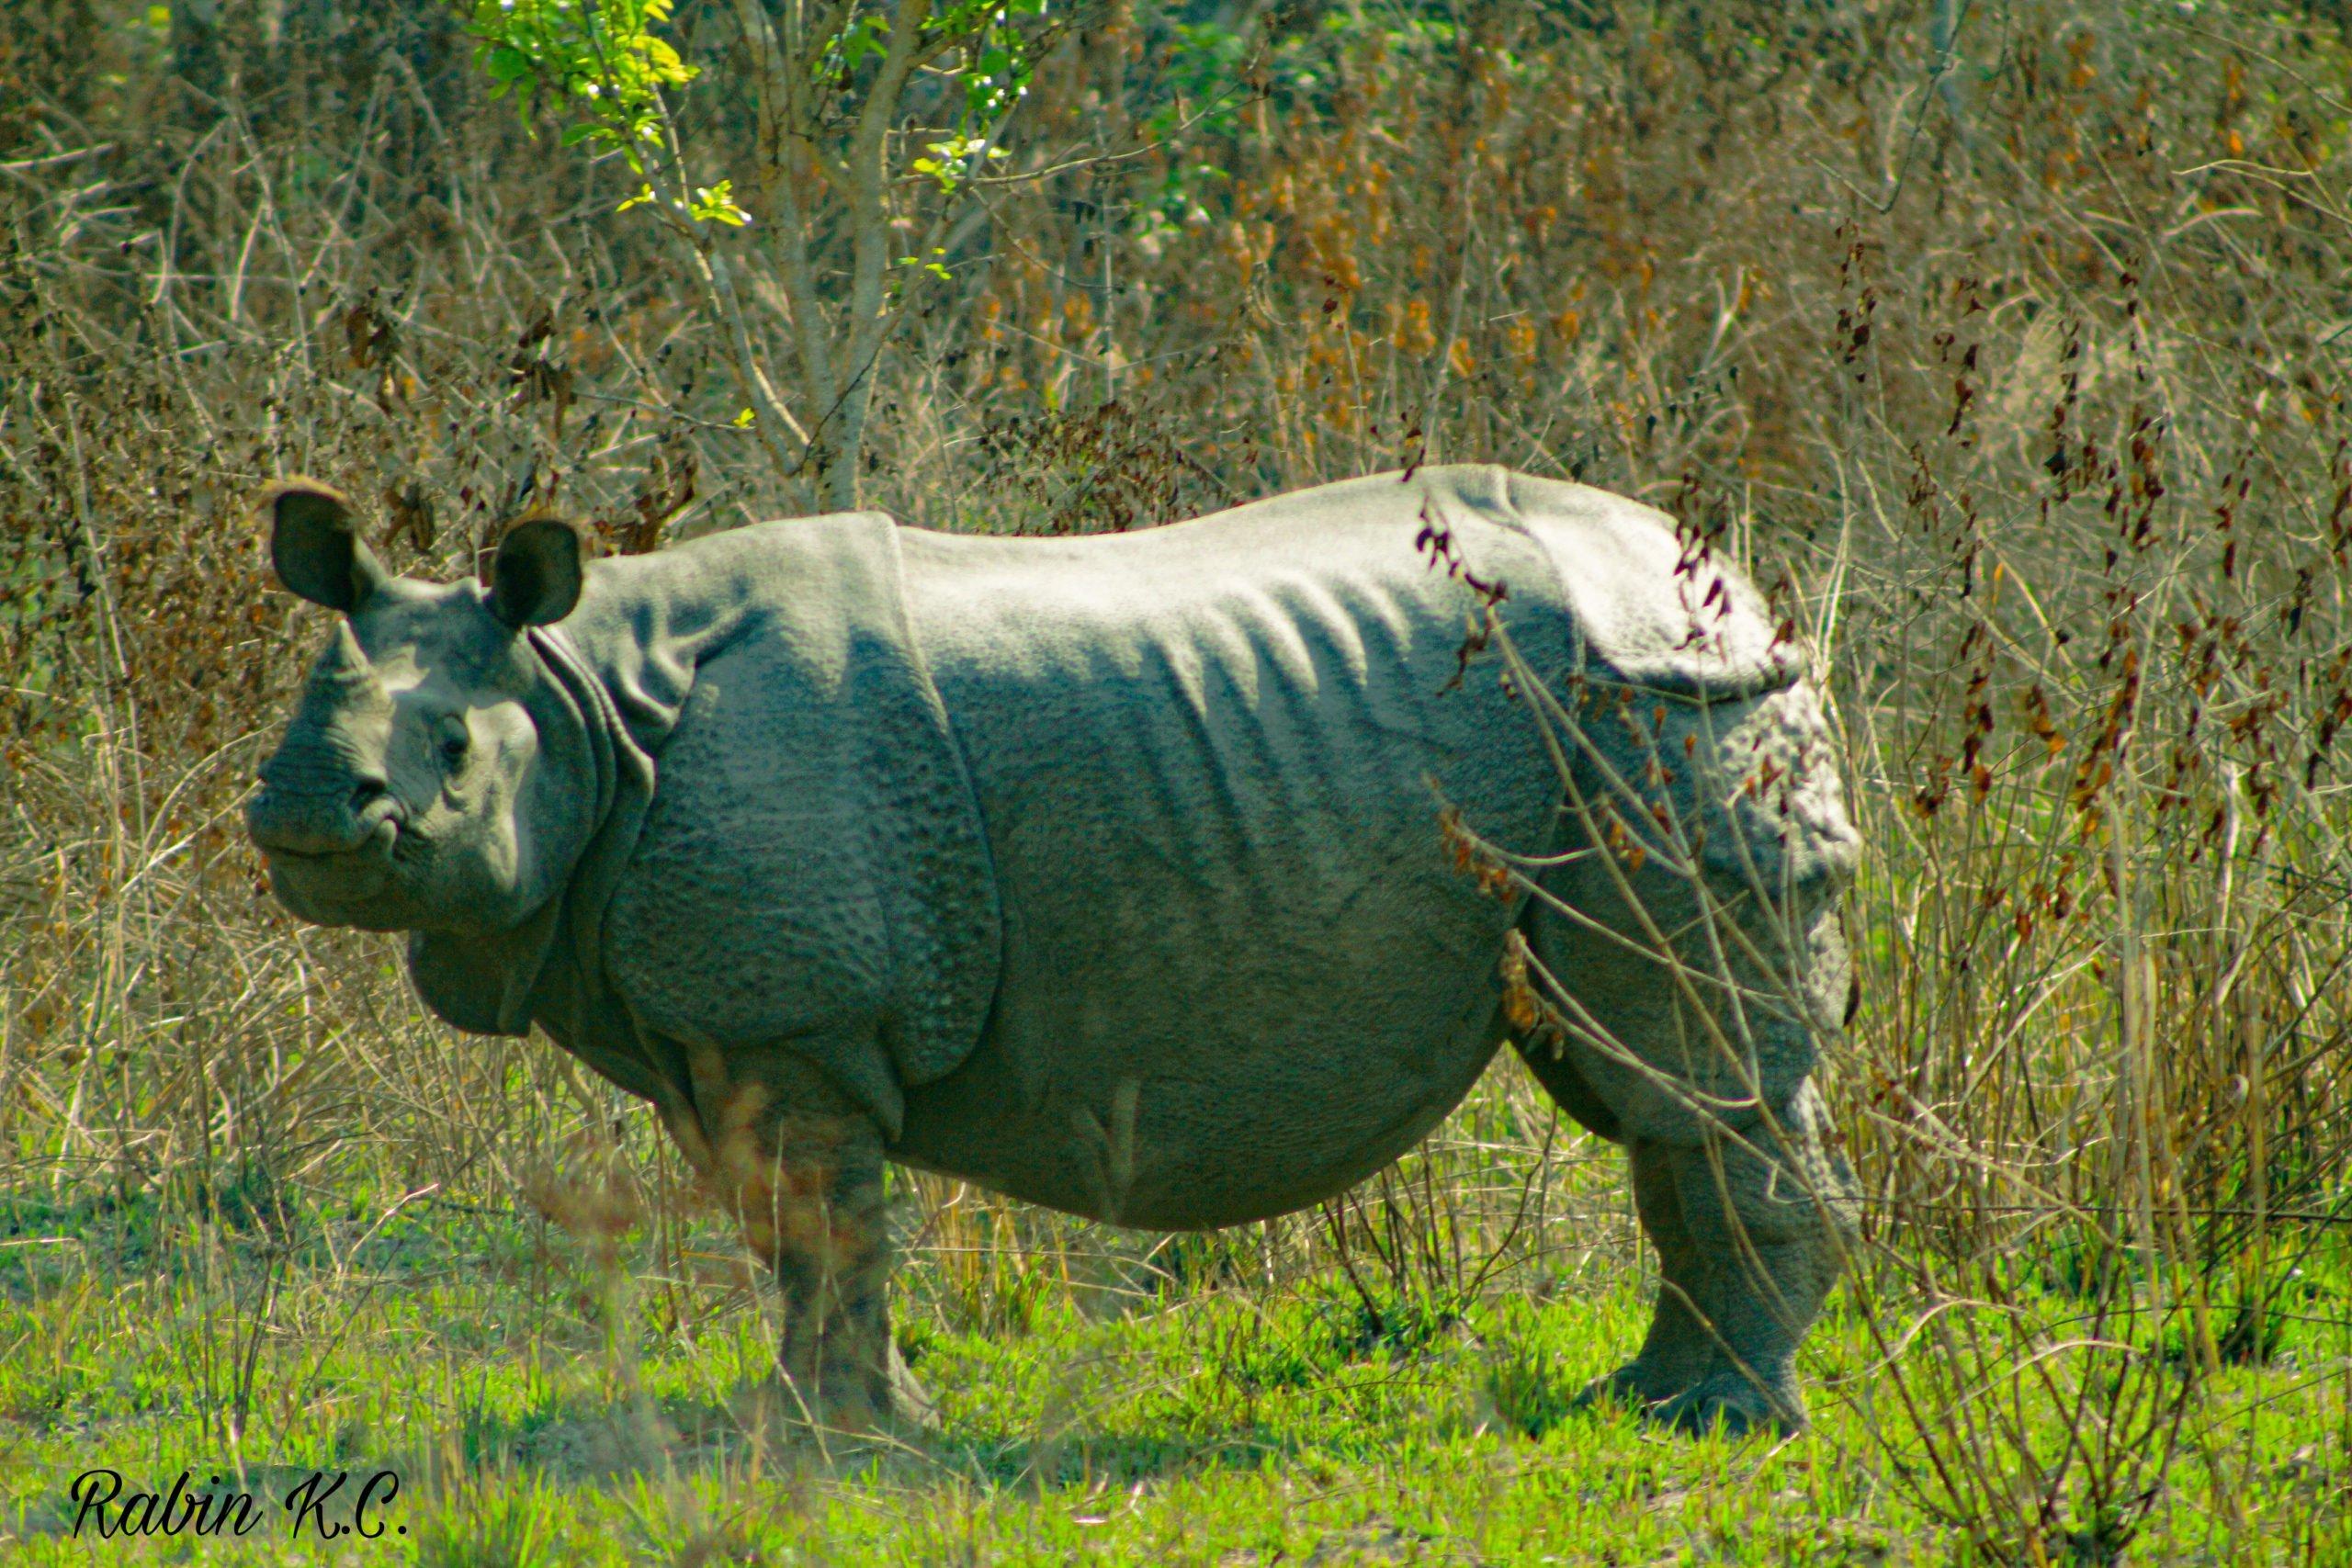 Sibu Pothi, the female rhino who was the author's first sighting during Nepal's 2021 rhino census (Image: Rabin Bahadur K.C.)